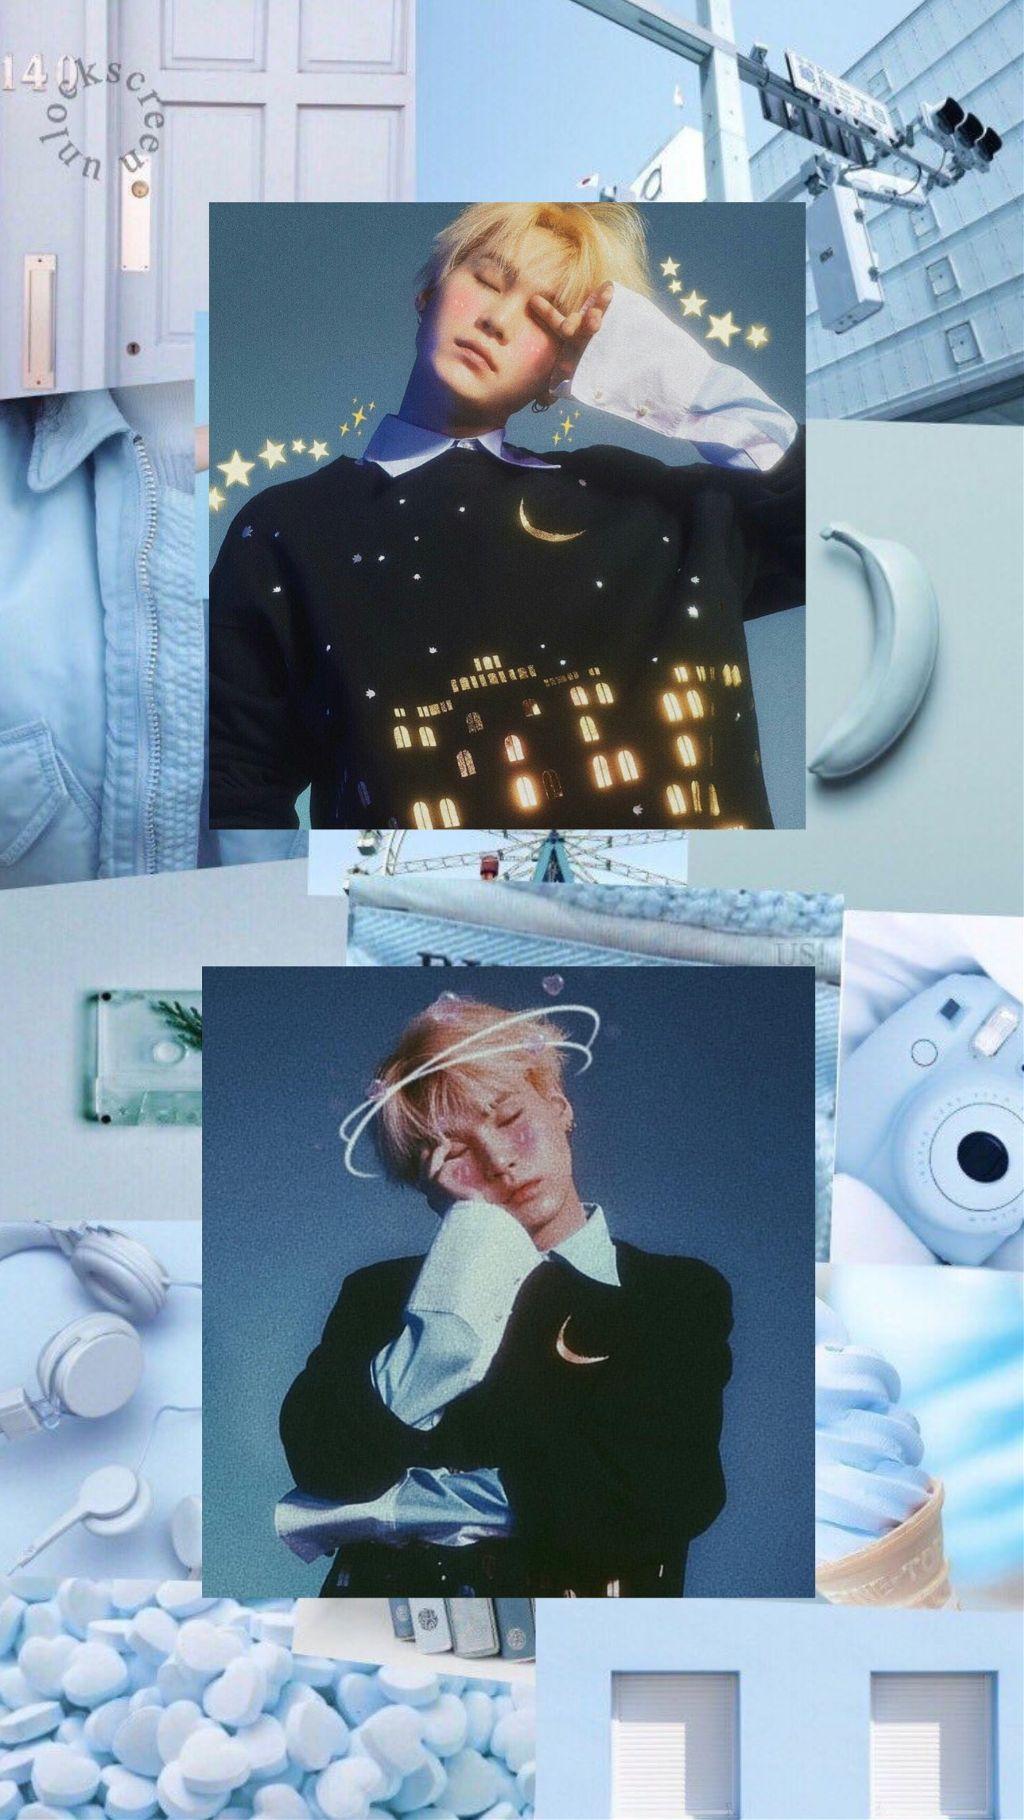 Yoongi Aesthetic Wallpaper Btssuga Aesthetickpop Bts